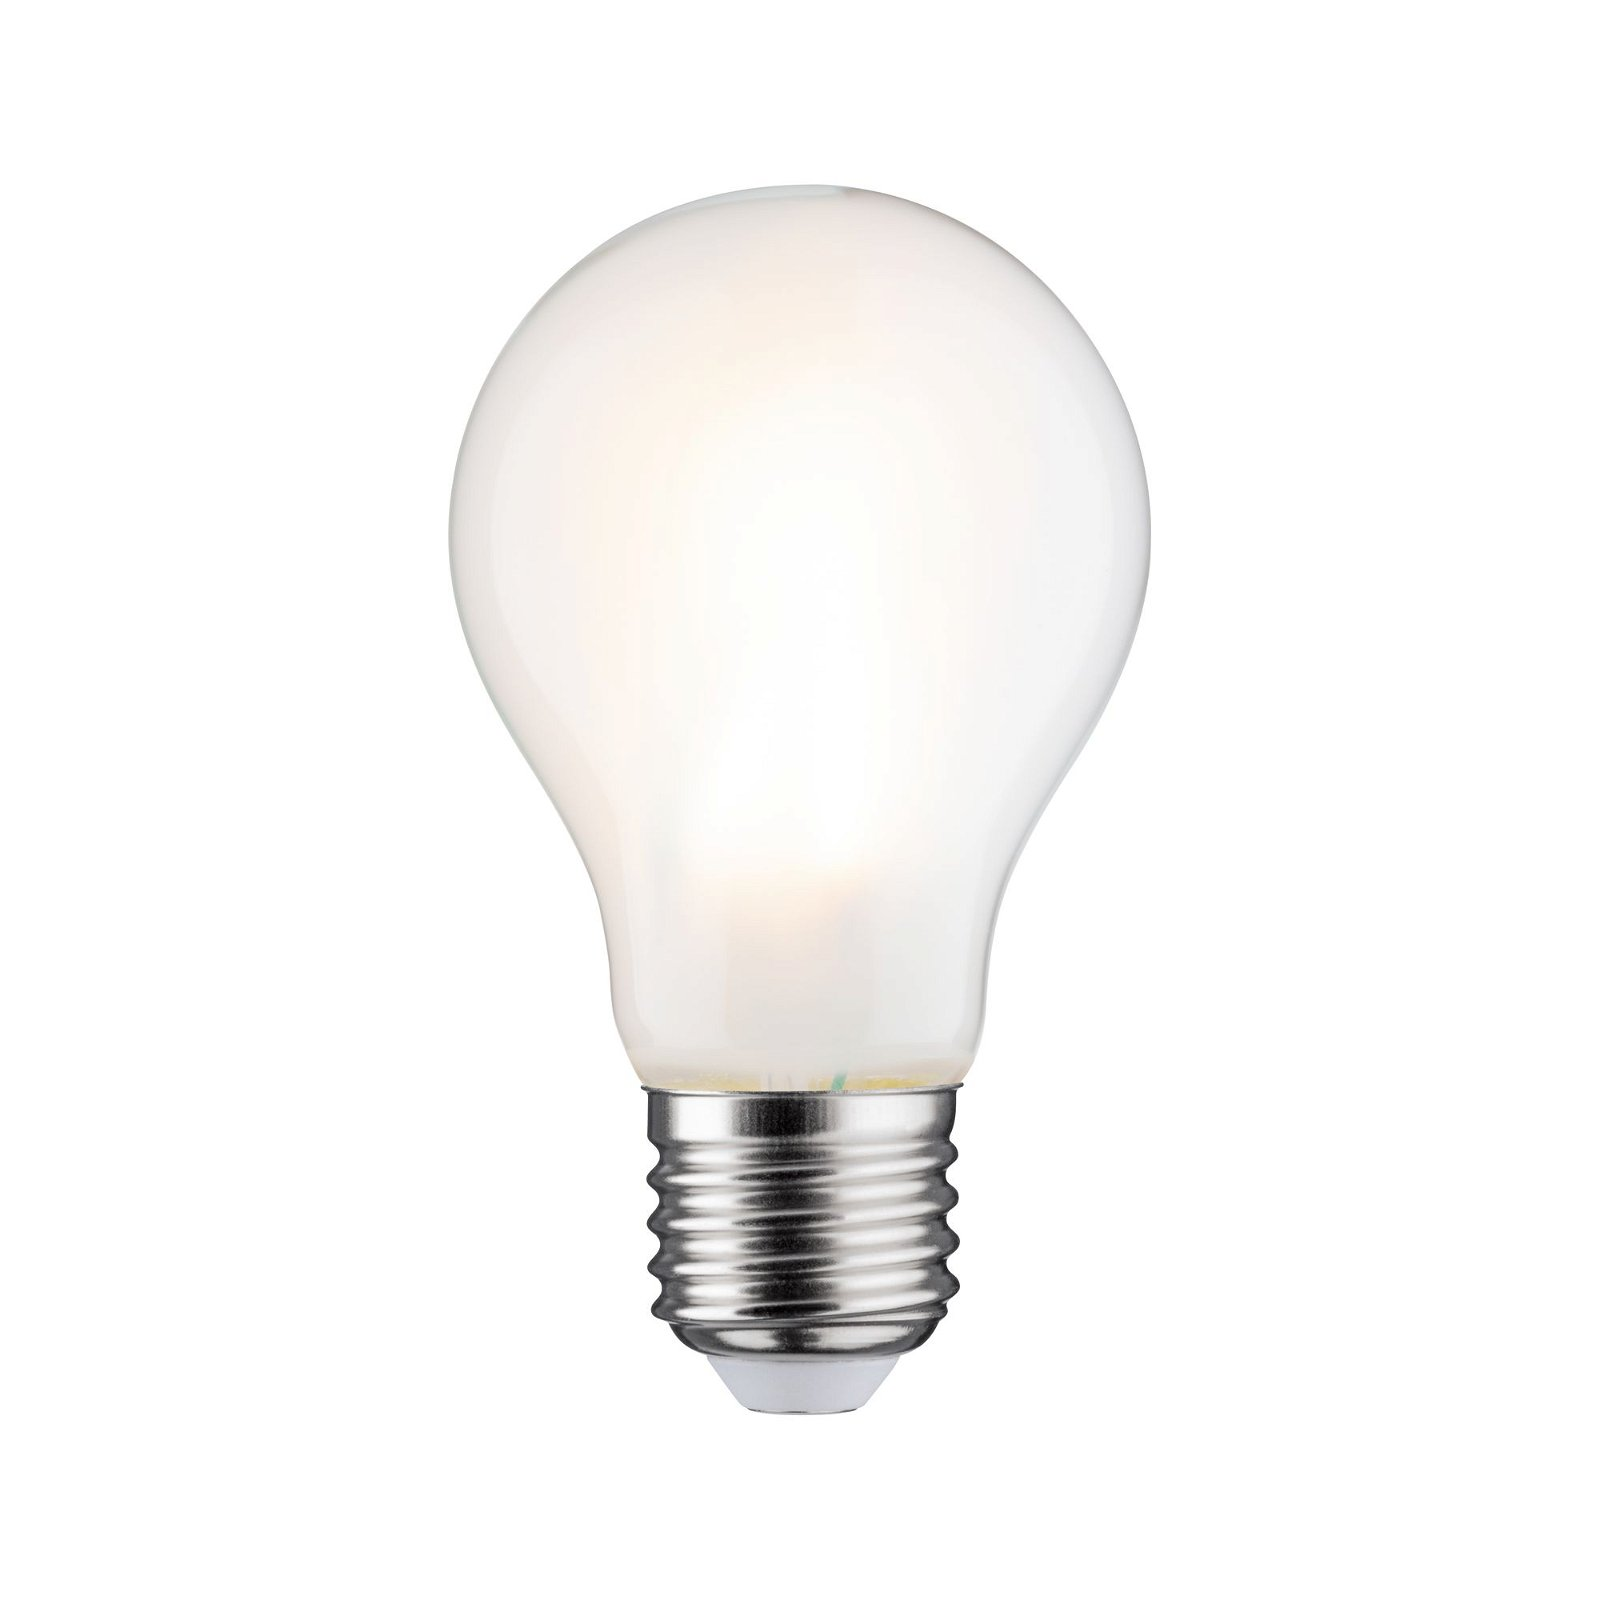 LED Birne Filament E27 230V 806lm 7W 2200 - 6500K Matt